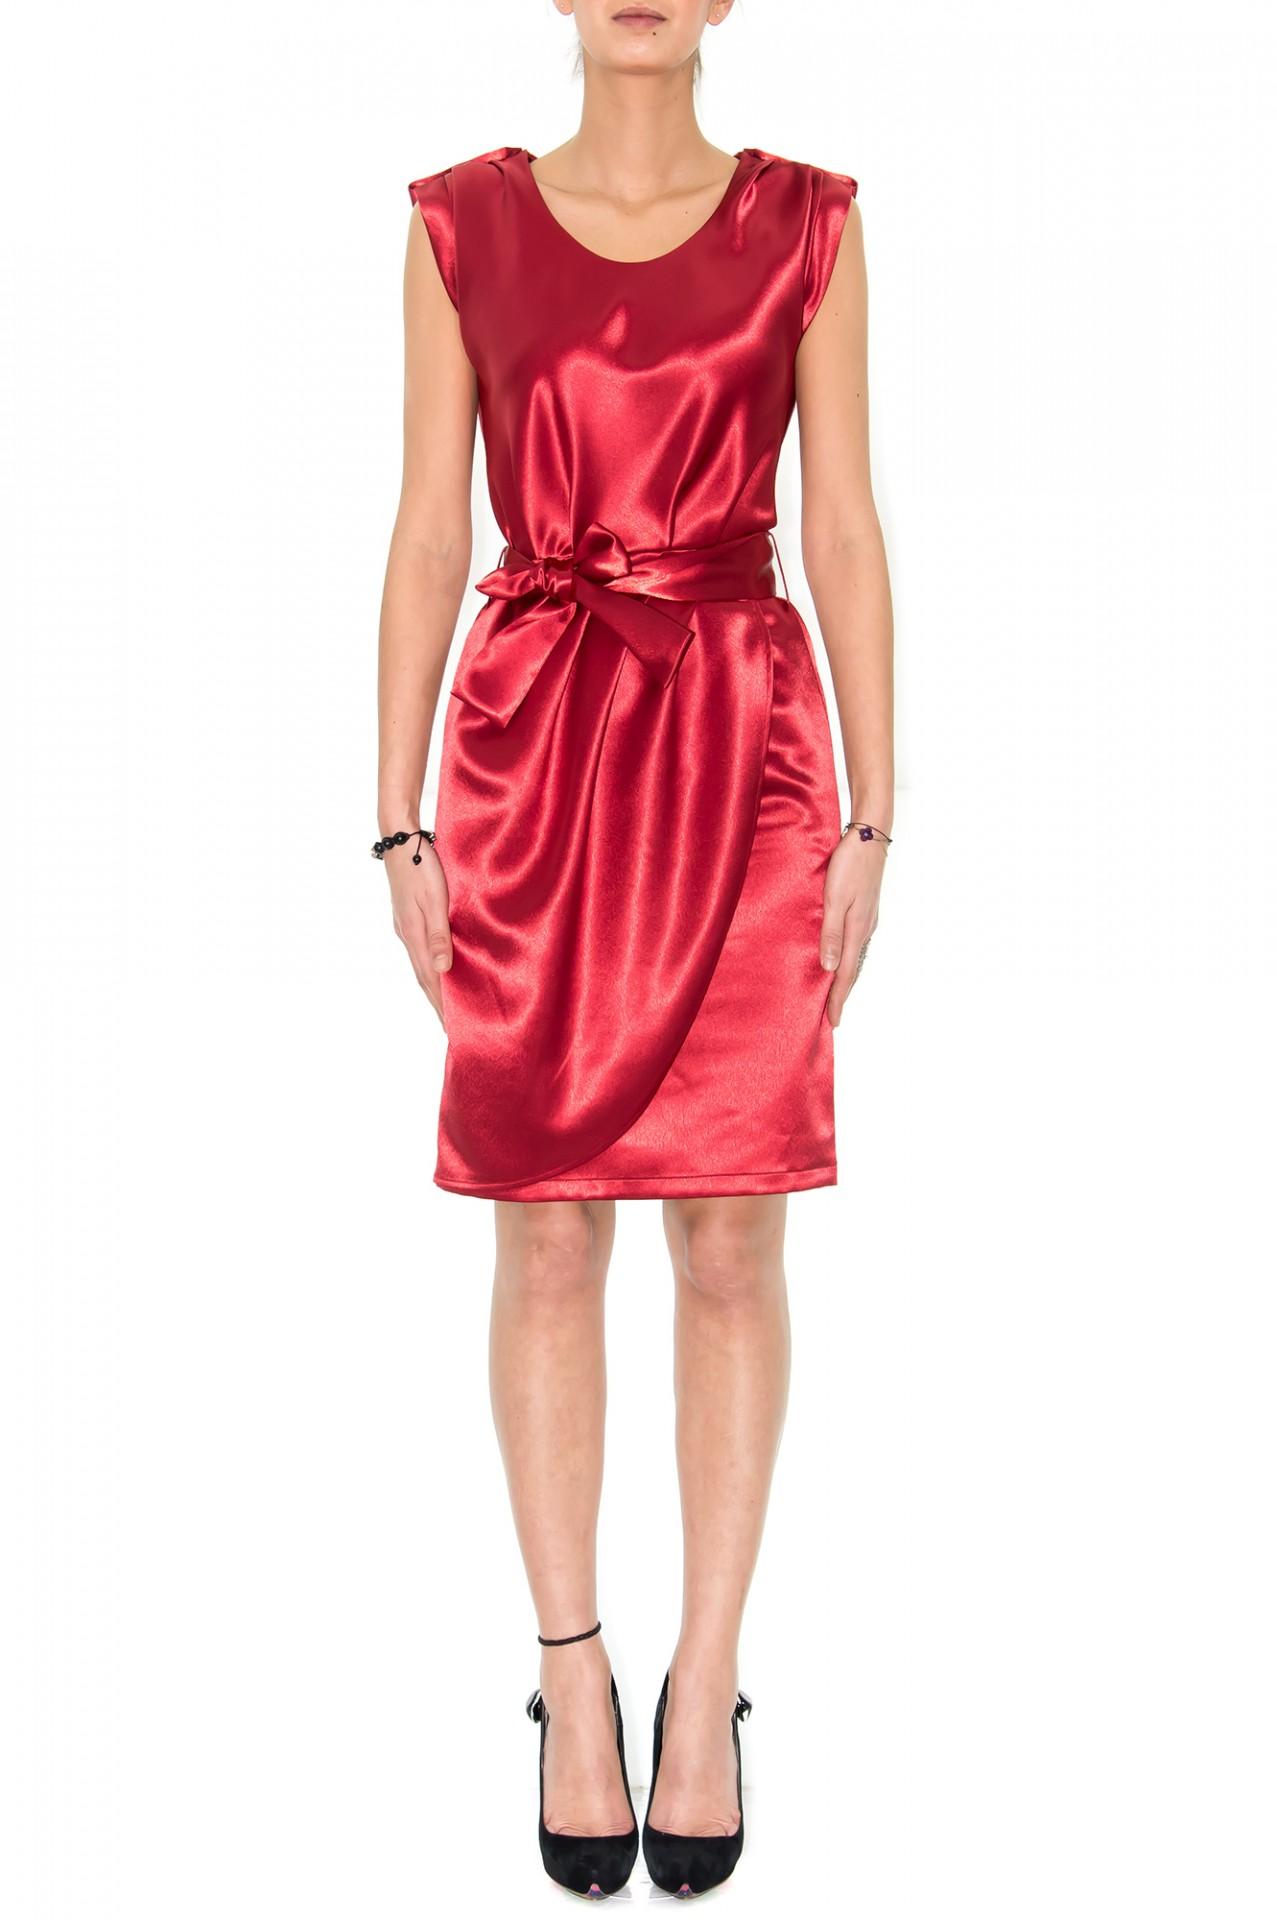 robe soir e robe satin robe rouge stefanie. Black Bedroom Furniture Sets. Home Design Ideas